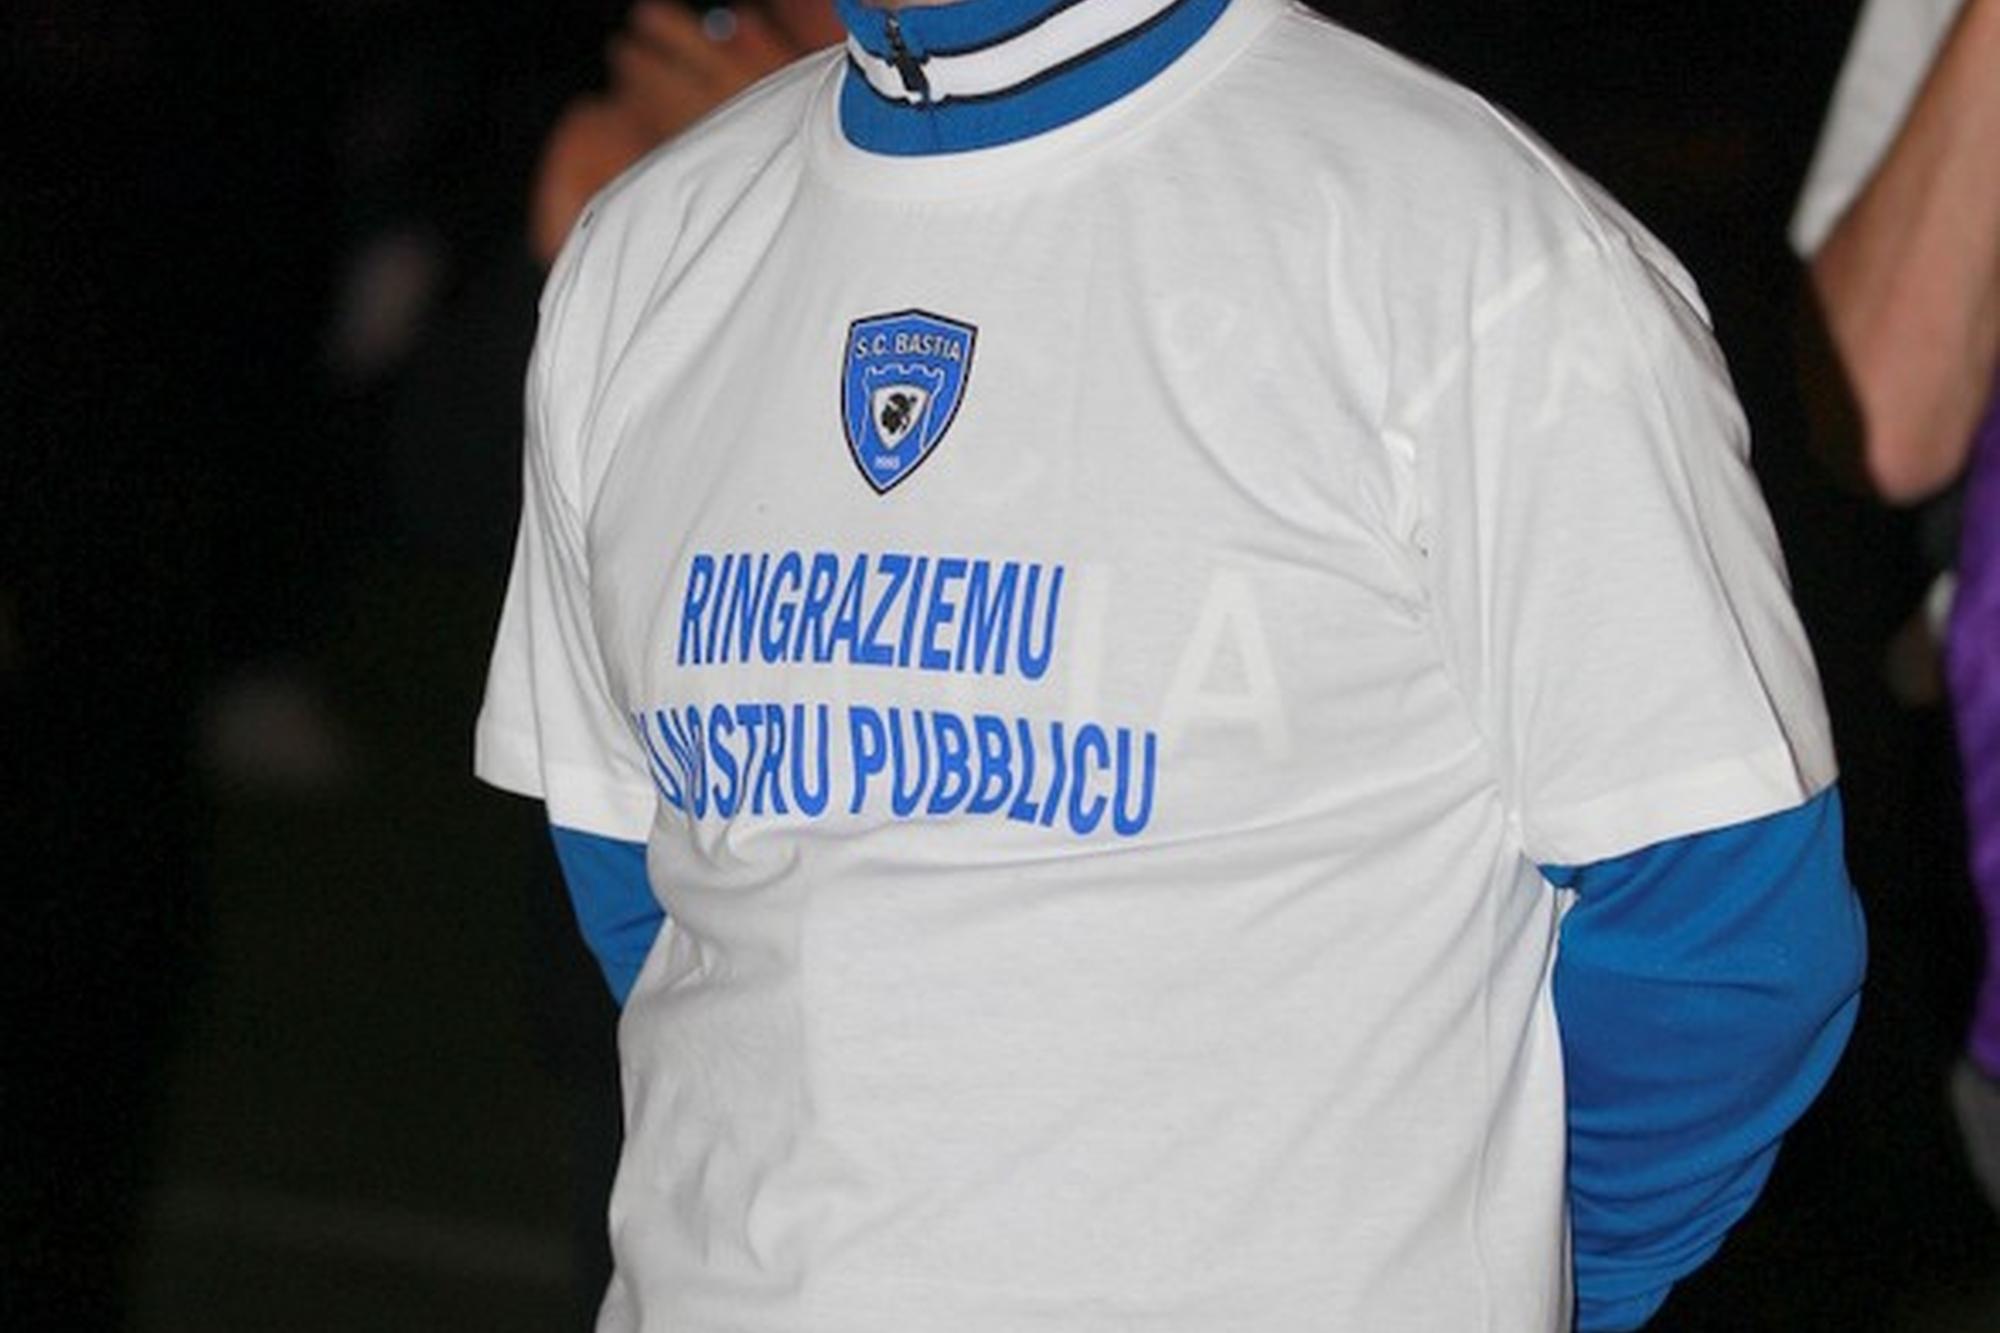 38.scbfcn